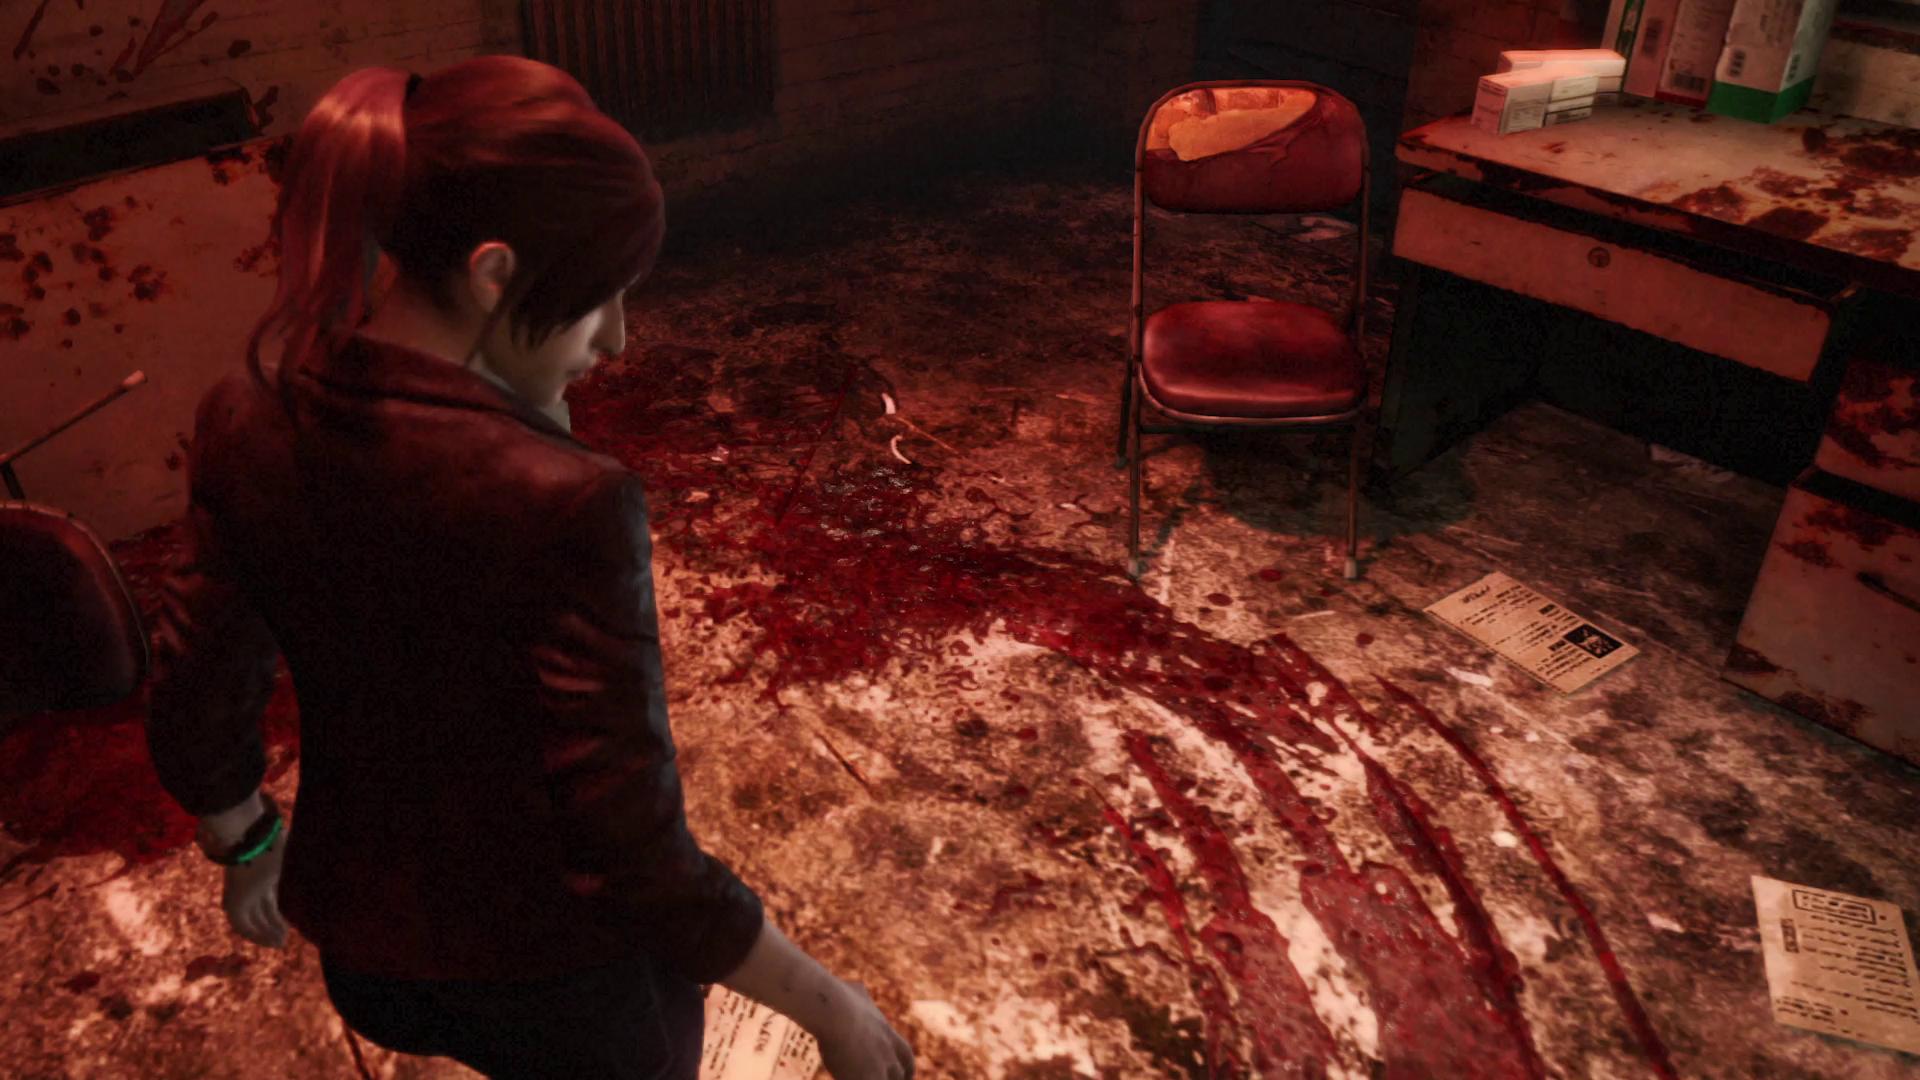 Resident Evil Revelations 2 ESPAÑOL PC Full + Update 2.1 (CODEX) + REPACK 3 DVD5 (JPW) 3